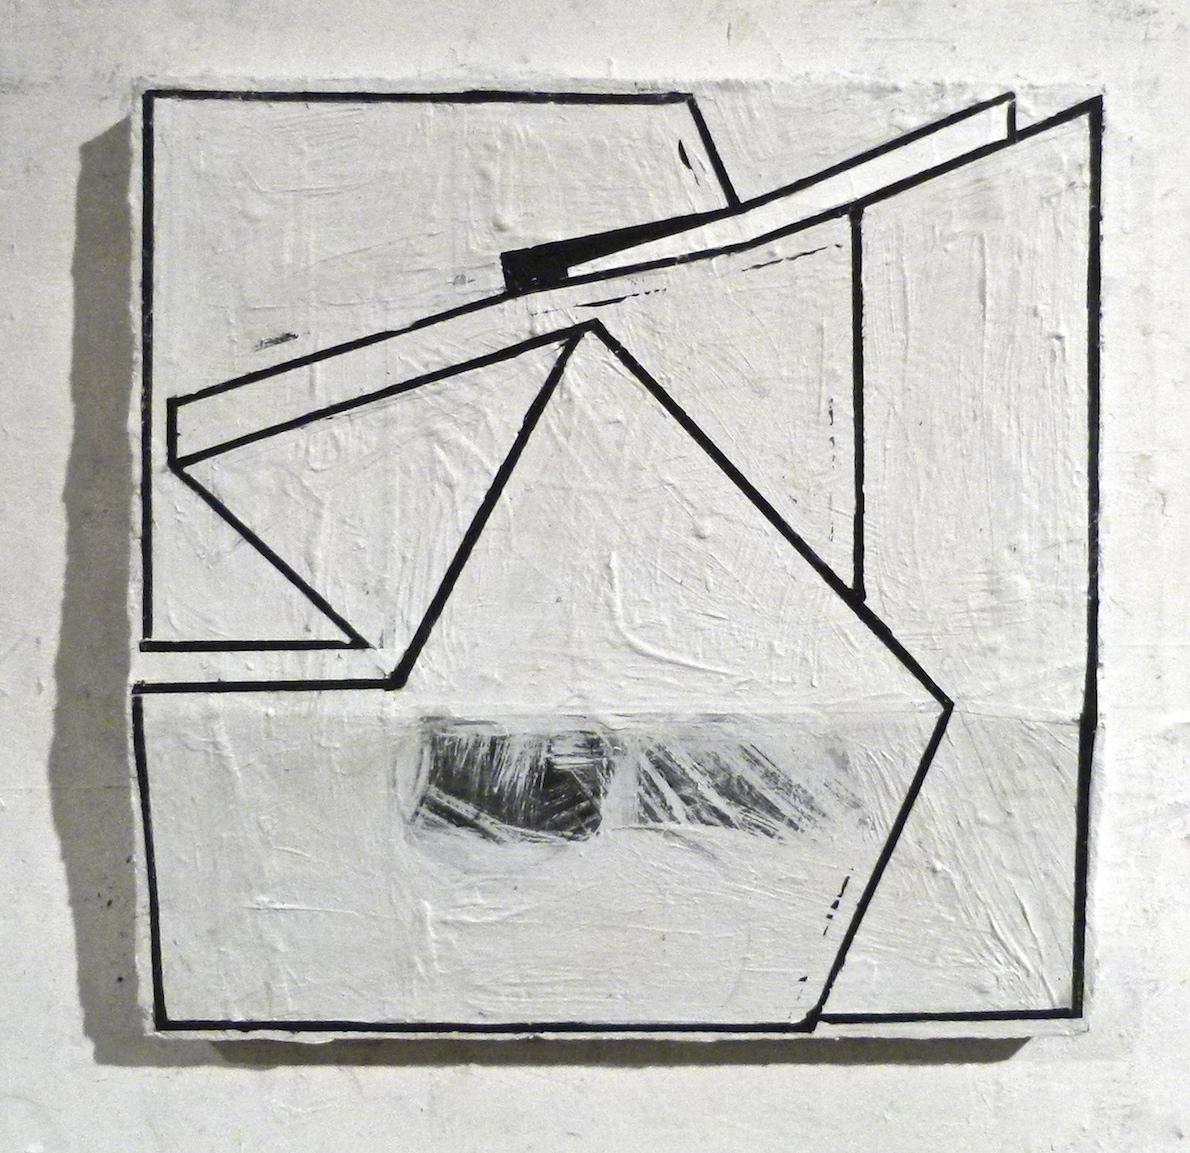 Convex Painting, 2016